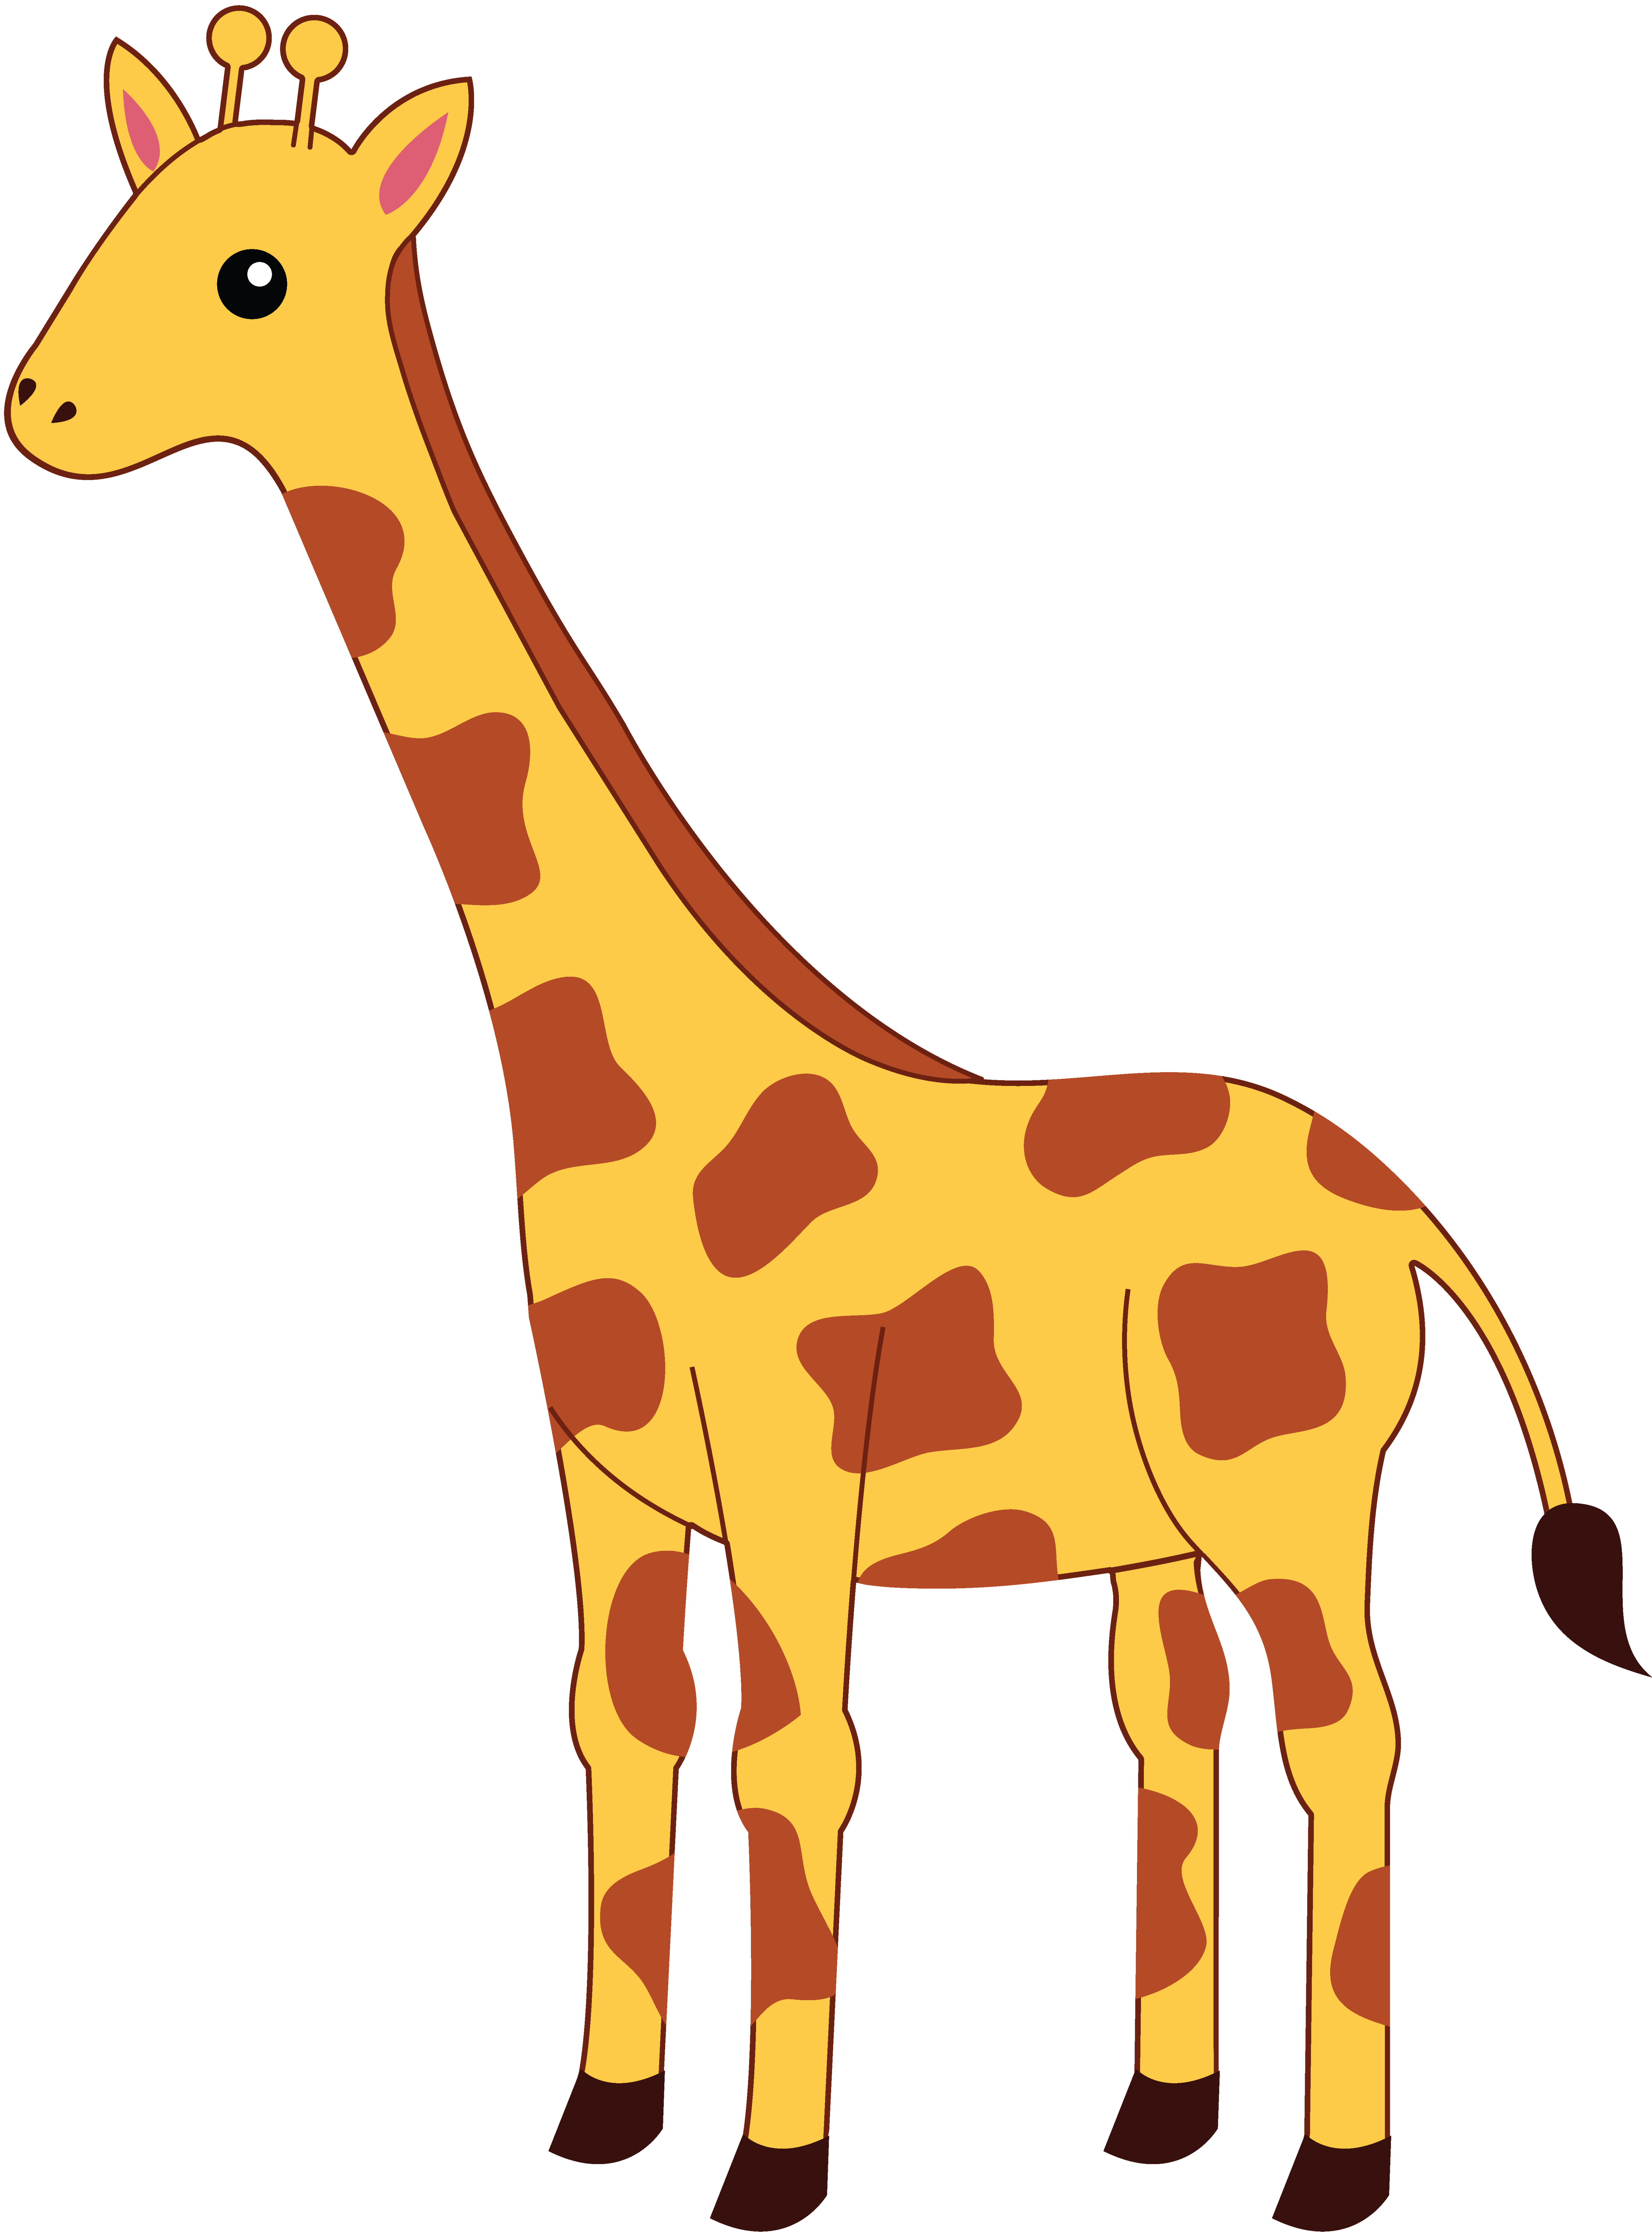 Clipart giraffe. Top free image